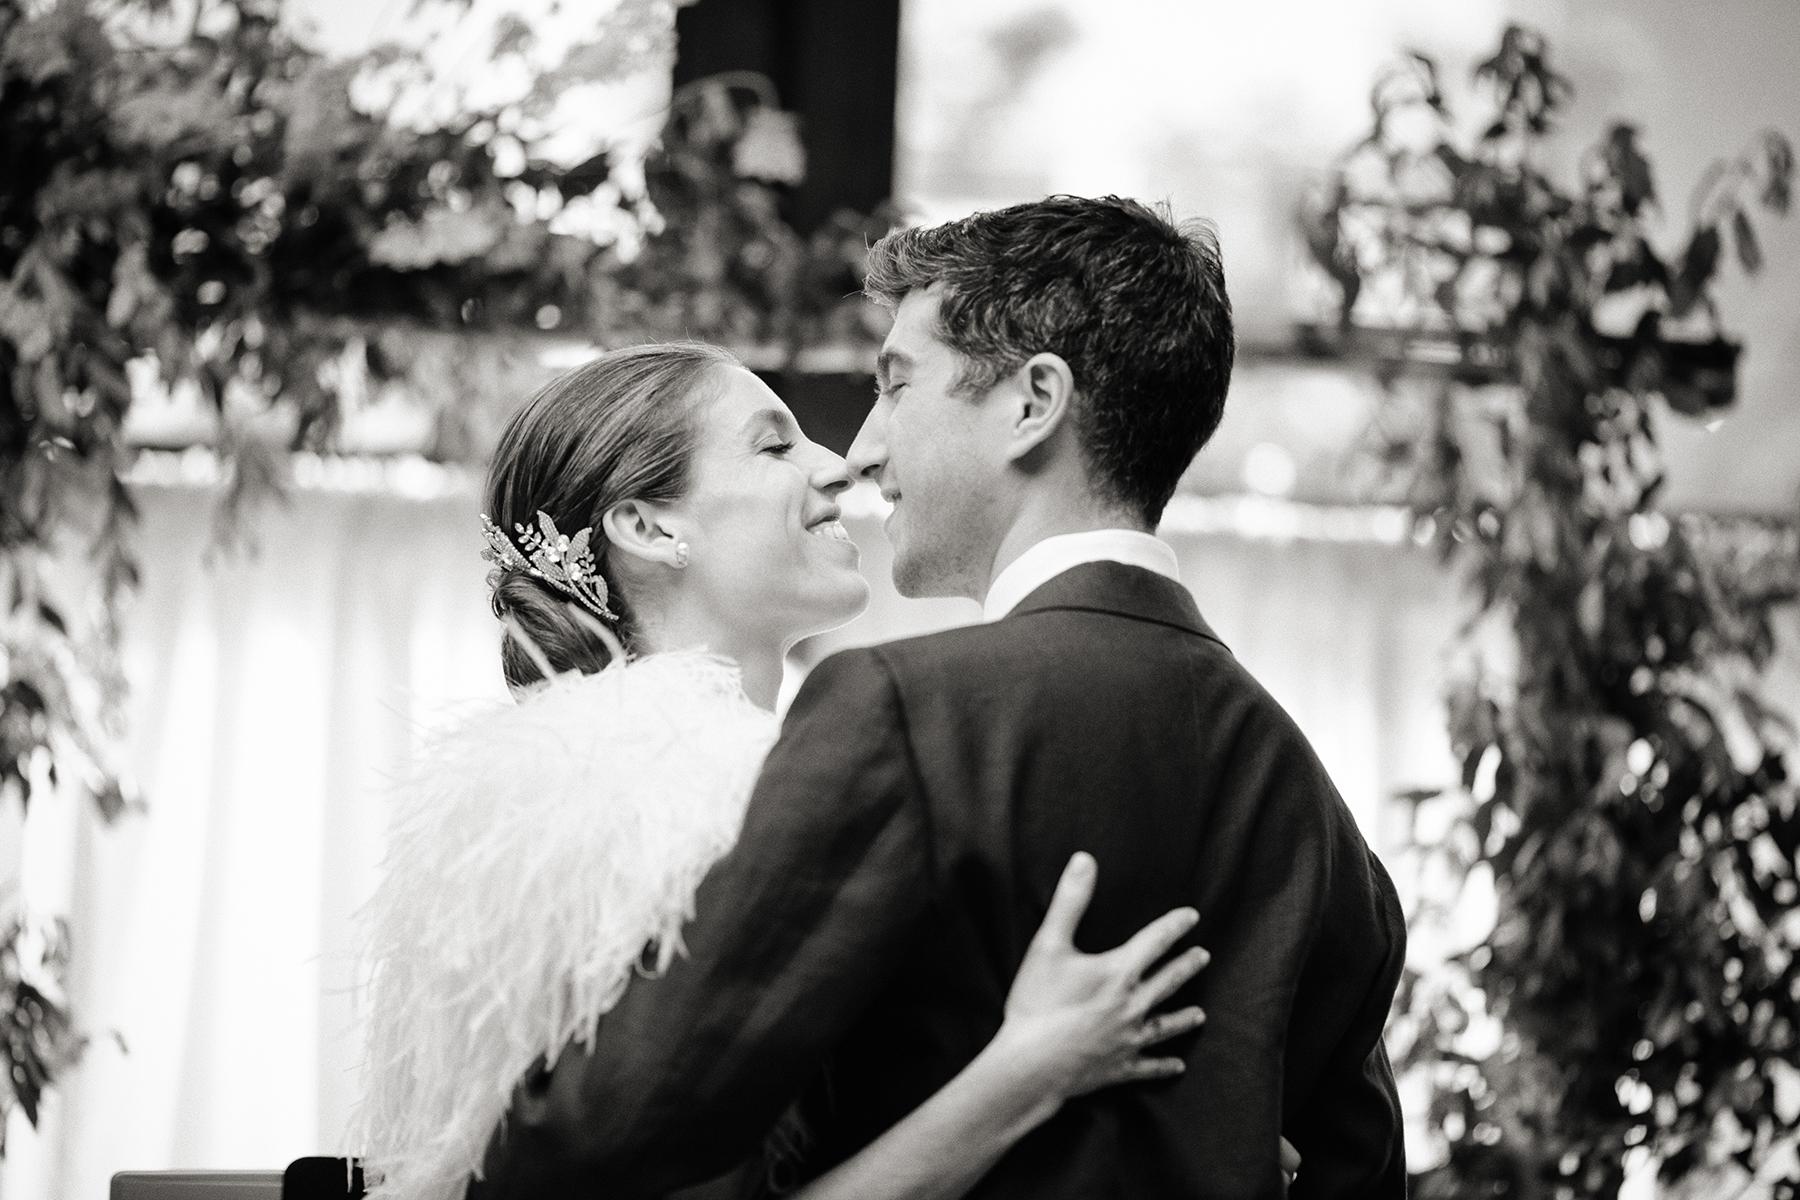 raquelreis_wedding_photography_brooklynwinery_034.jpg